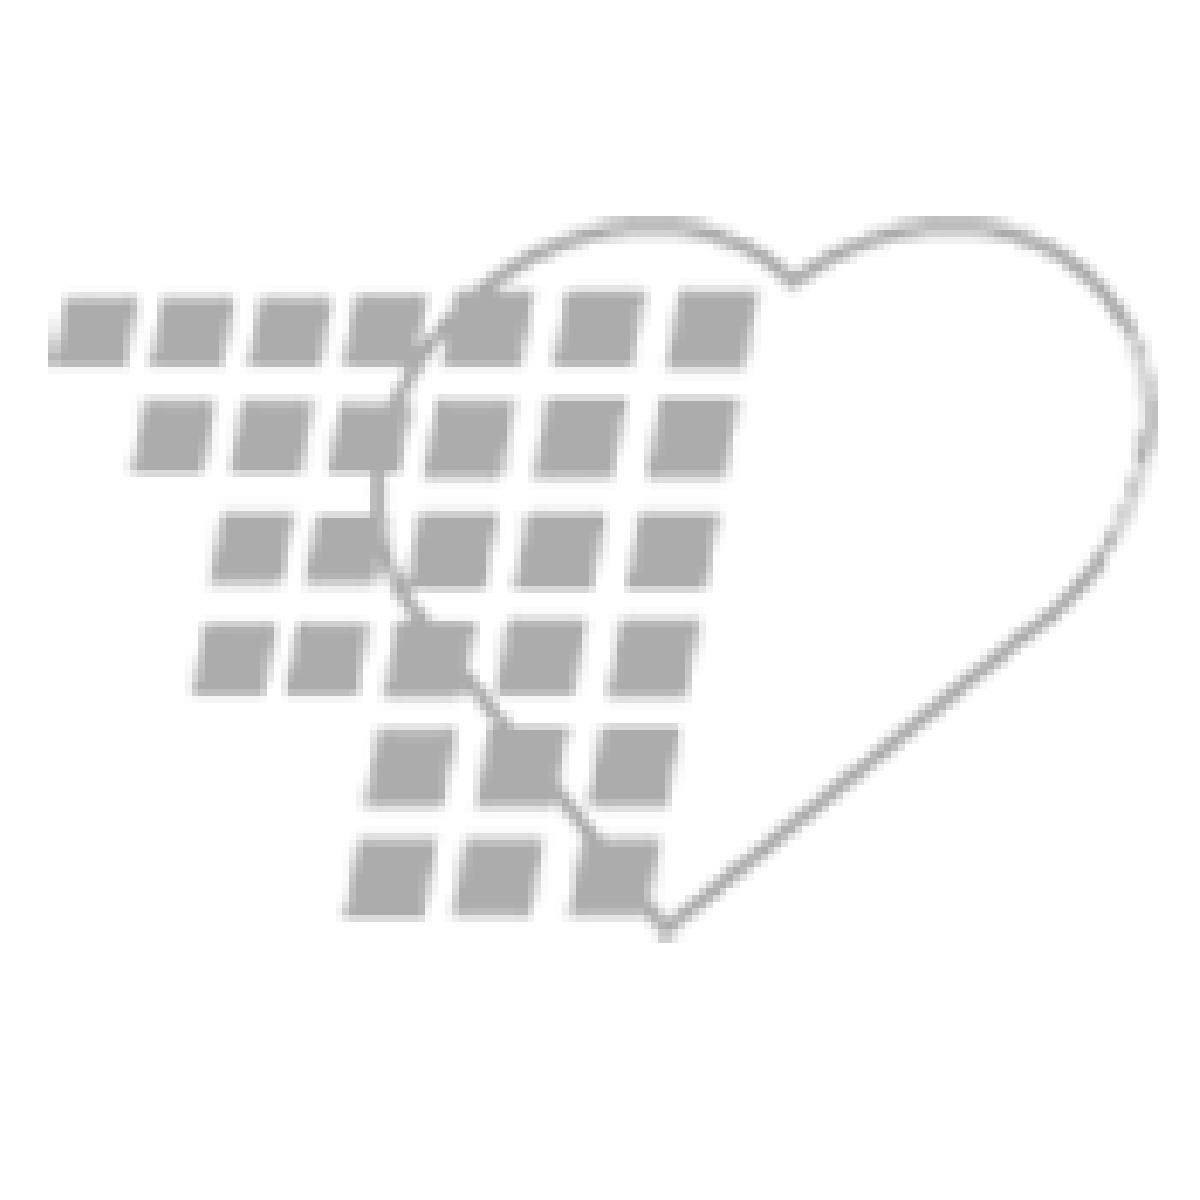 06-93-0065 - Demo Dose® ALPRAZolm (Xanx) 1 mg - 1000 Pills/Jar